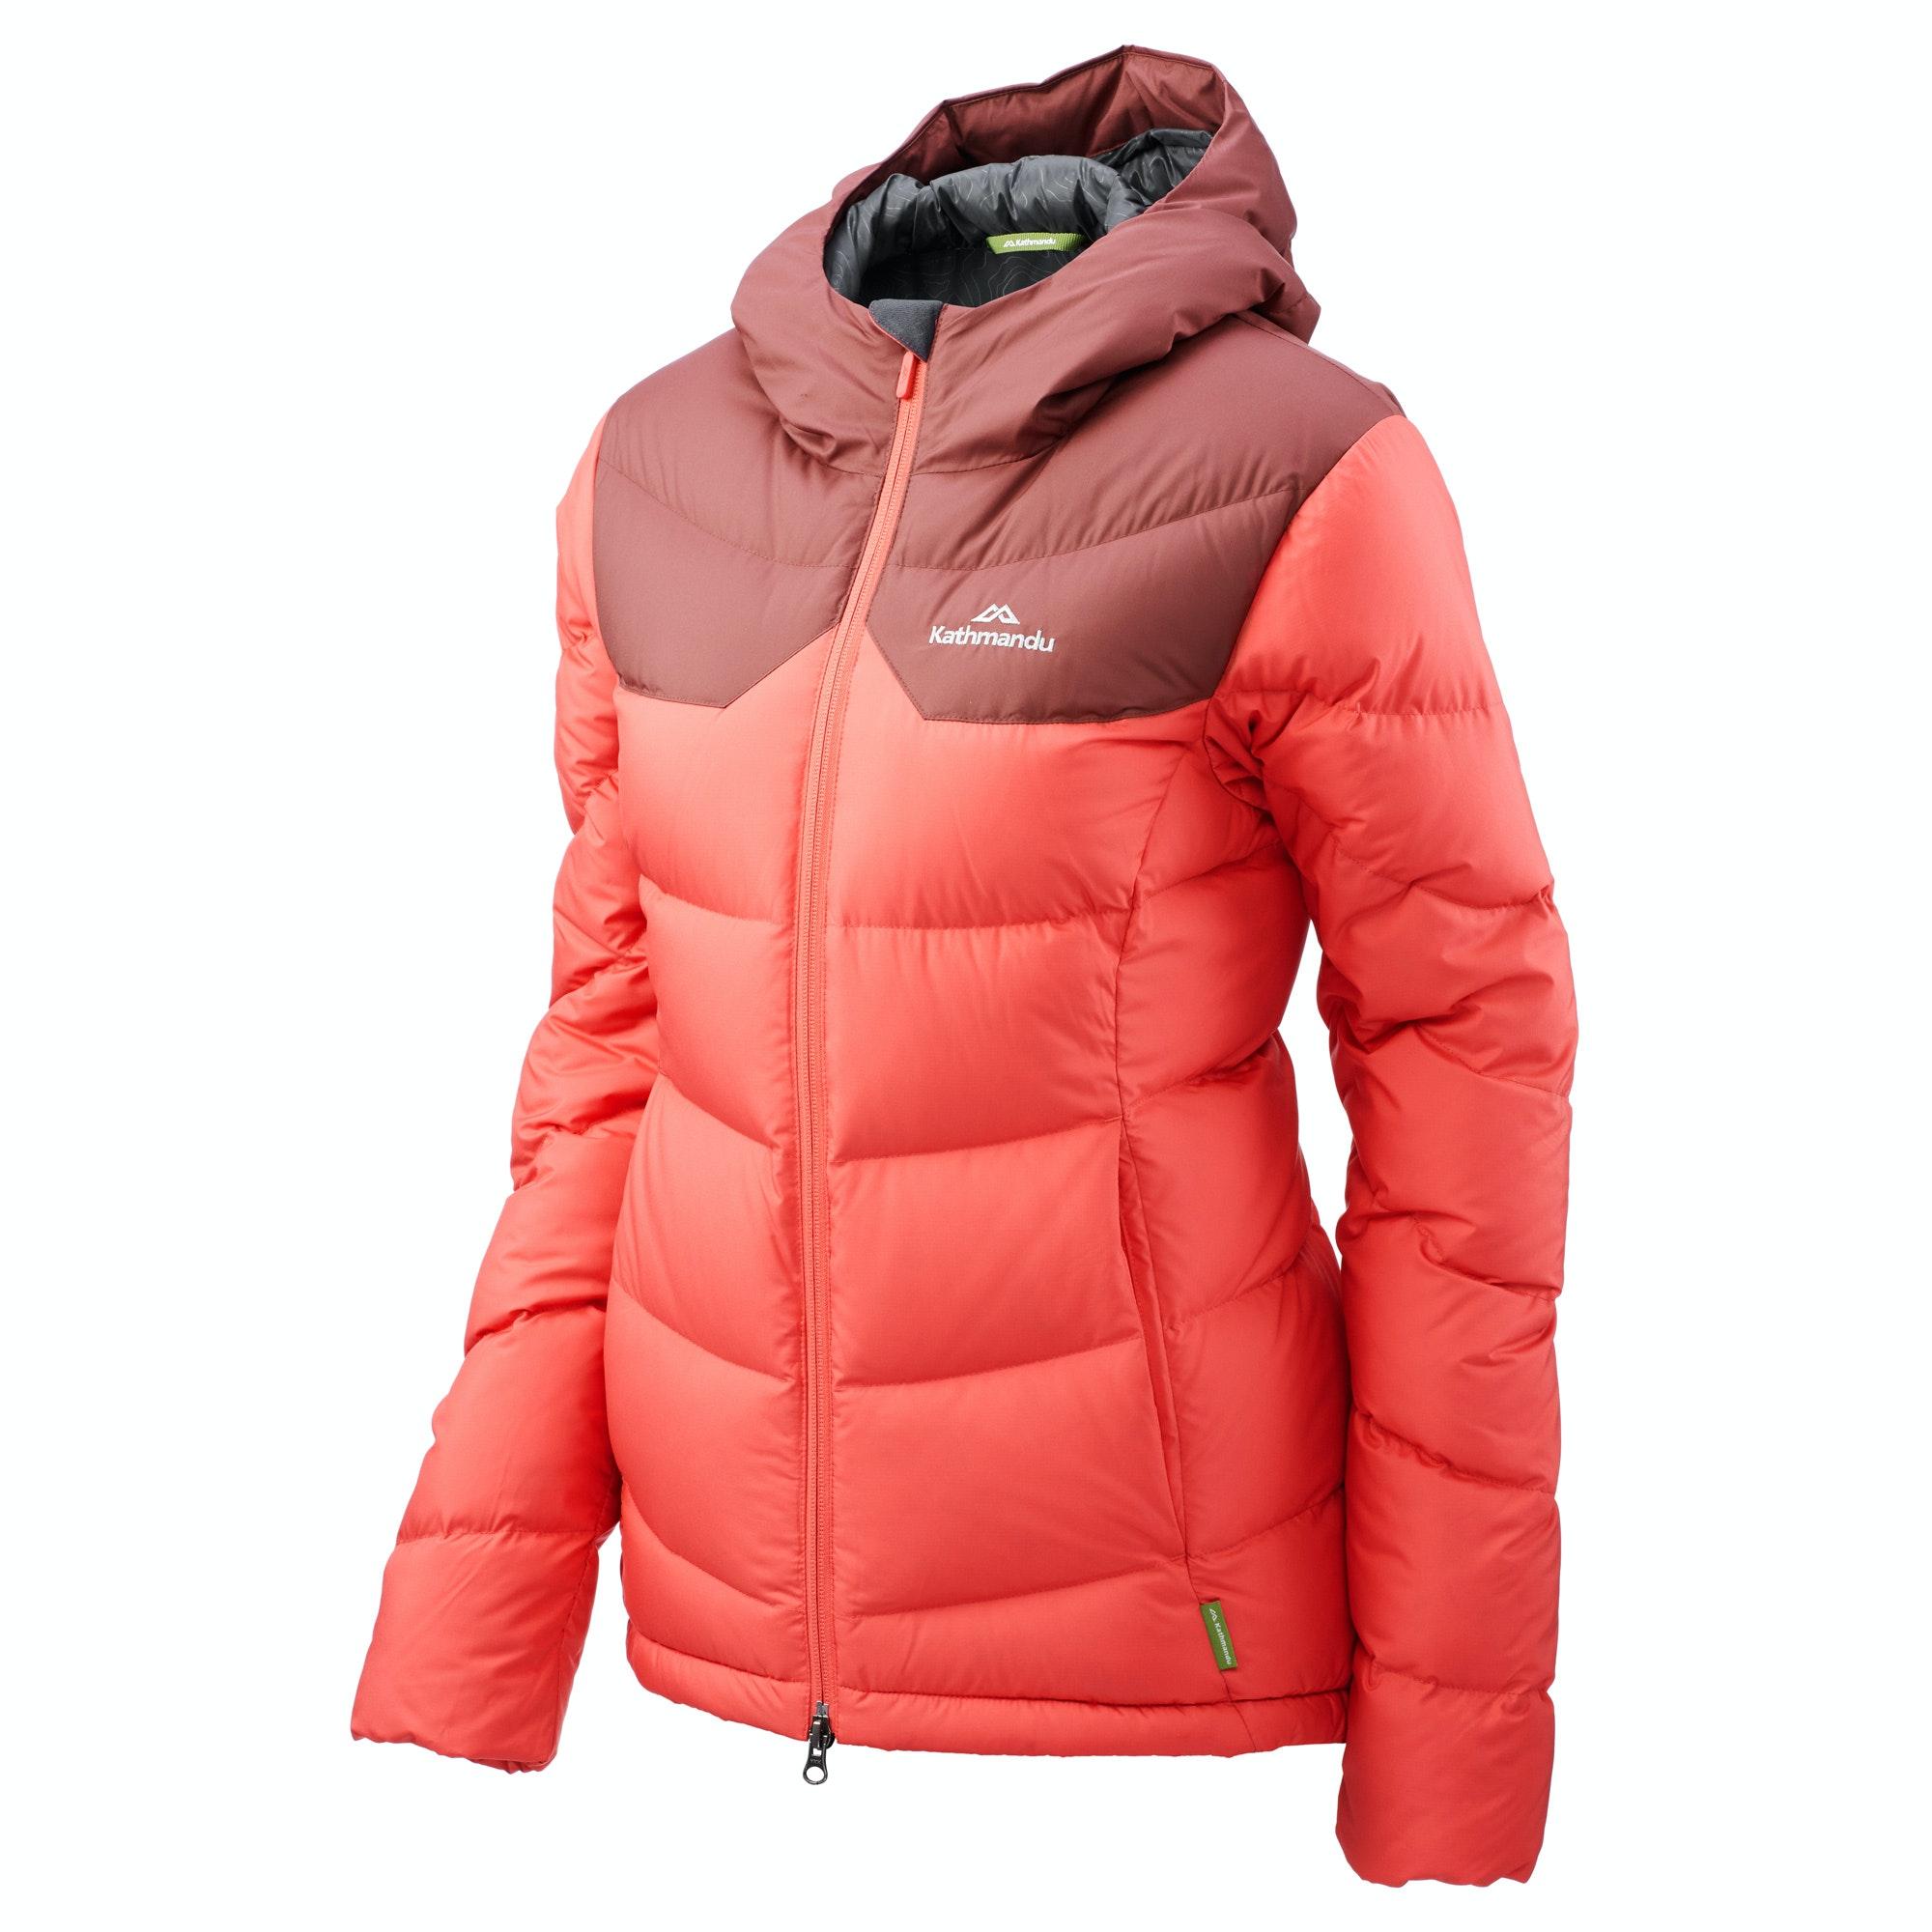 Epiq Womens Hooded Down Jacket